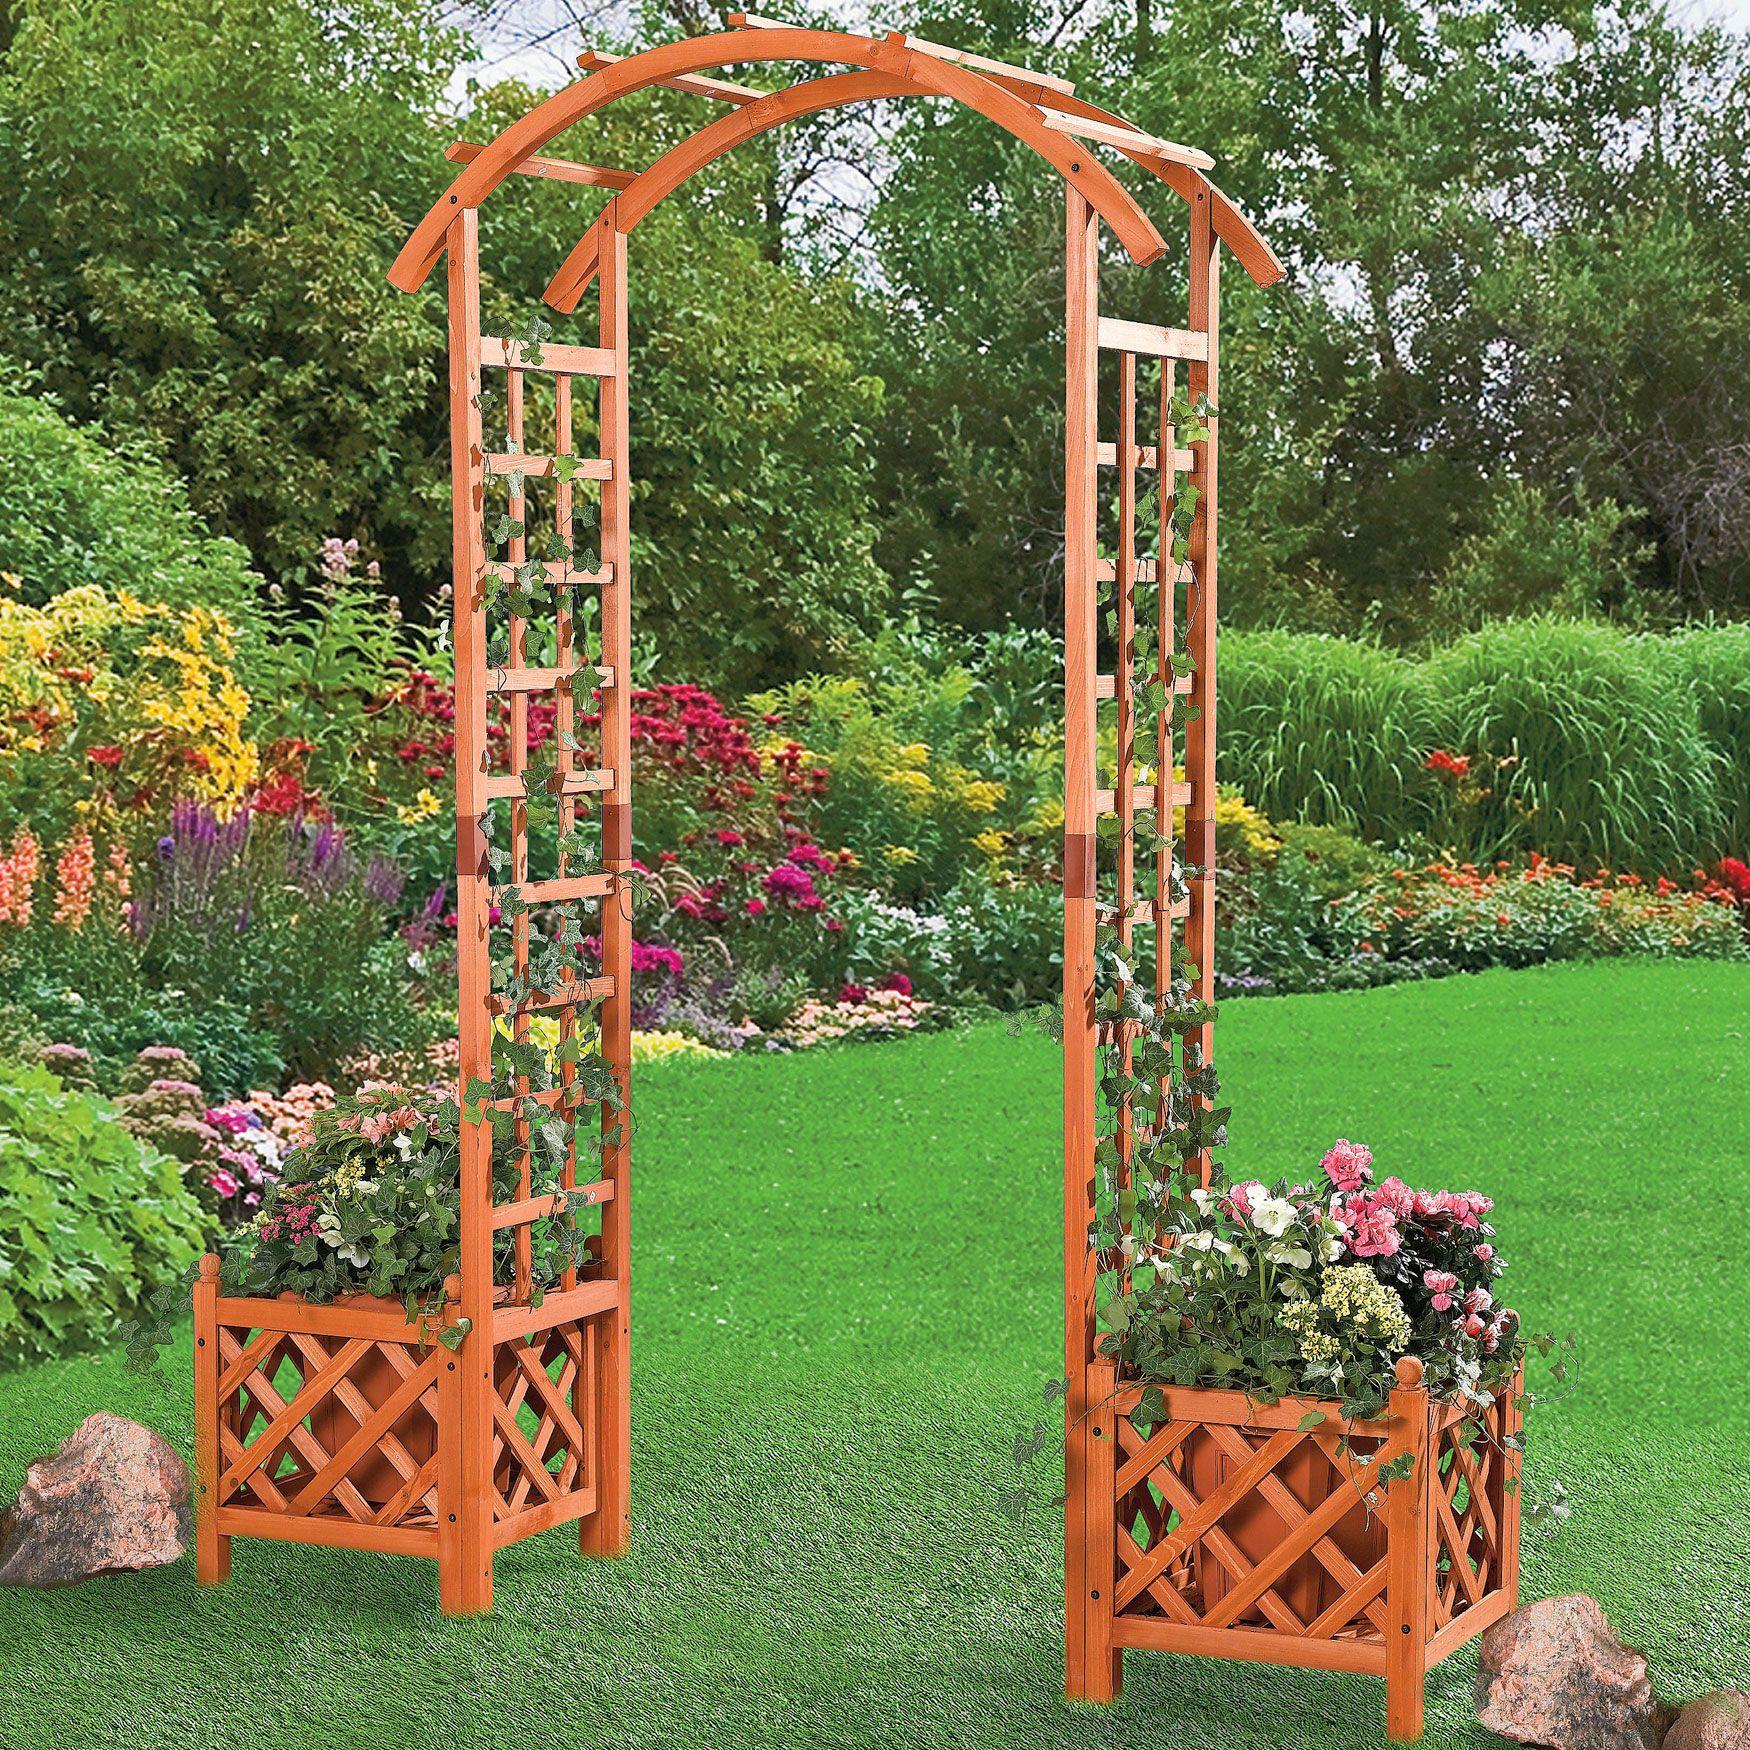 Wooden Arbor Trellis Garden Brylanehome Decor For